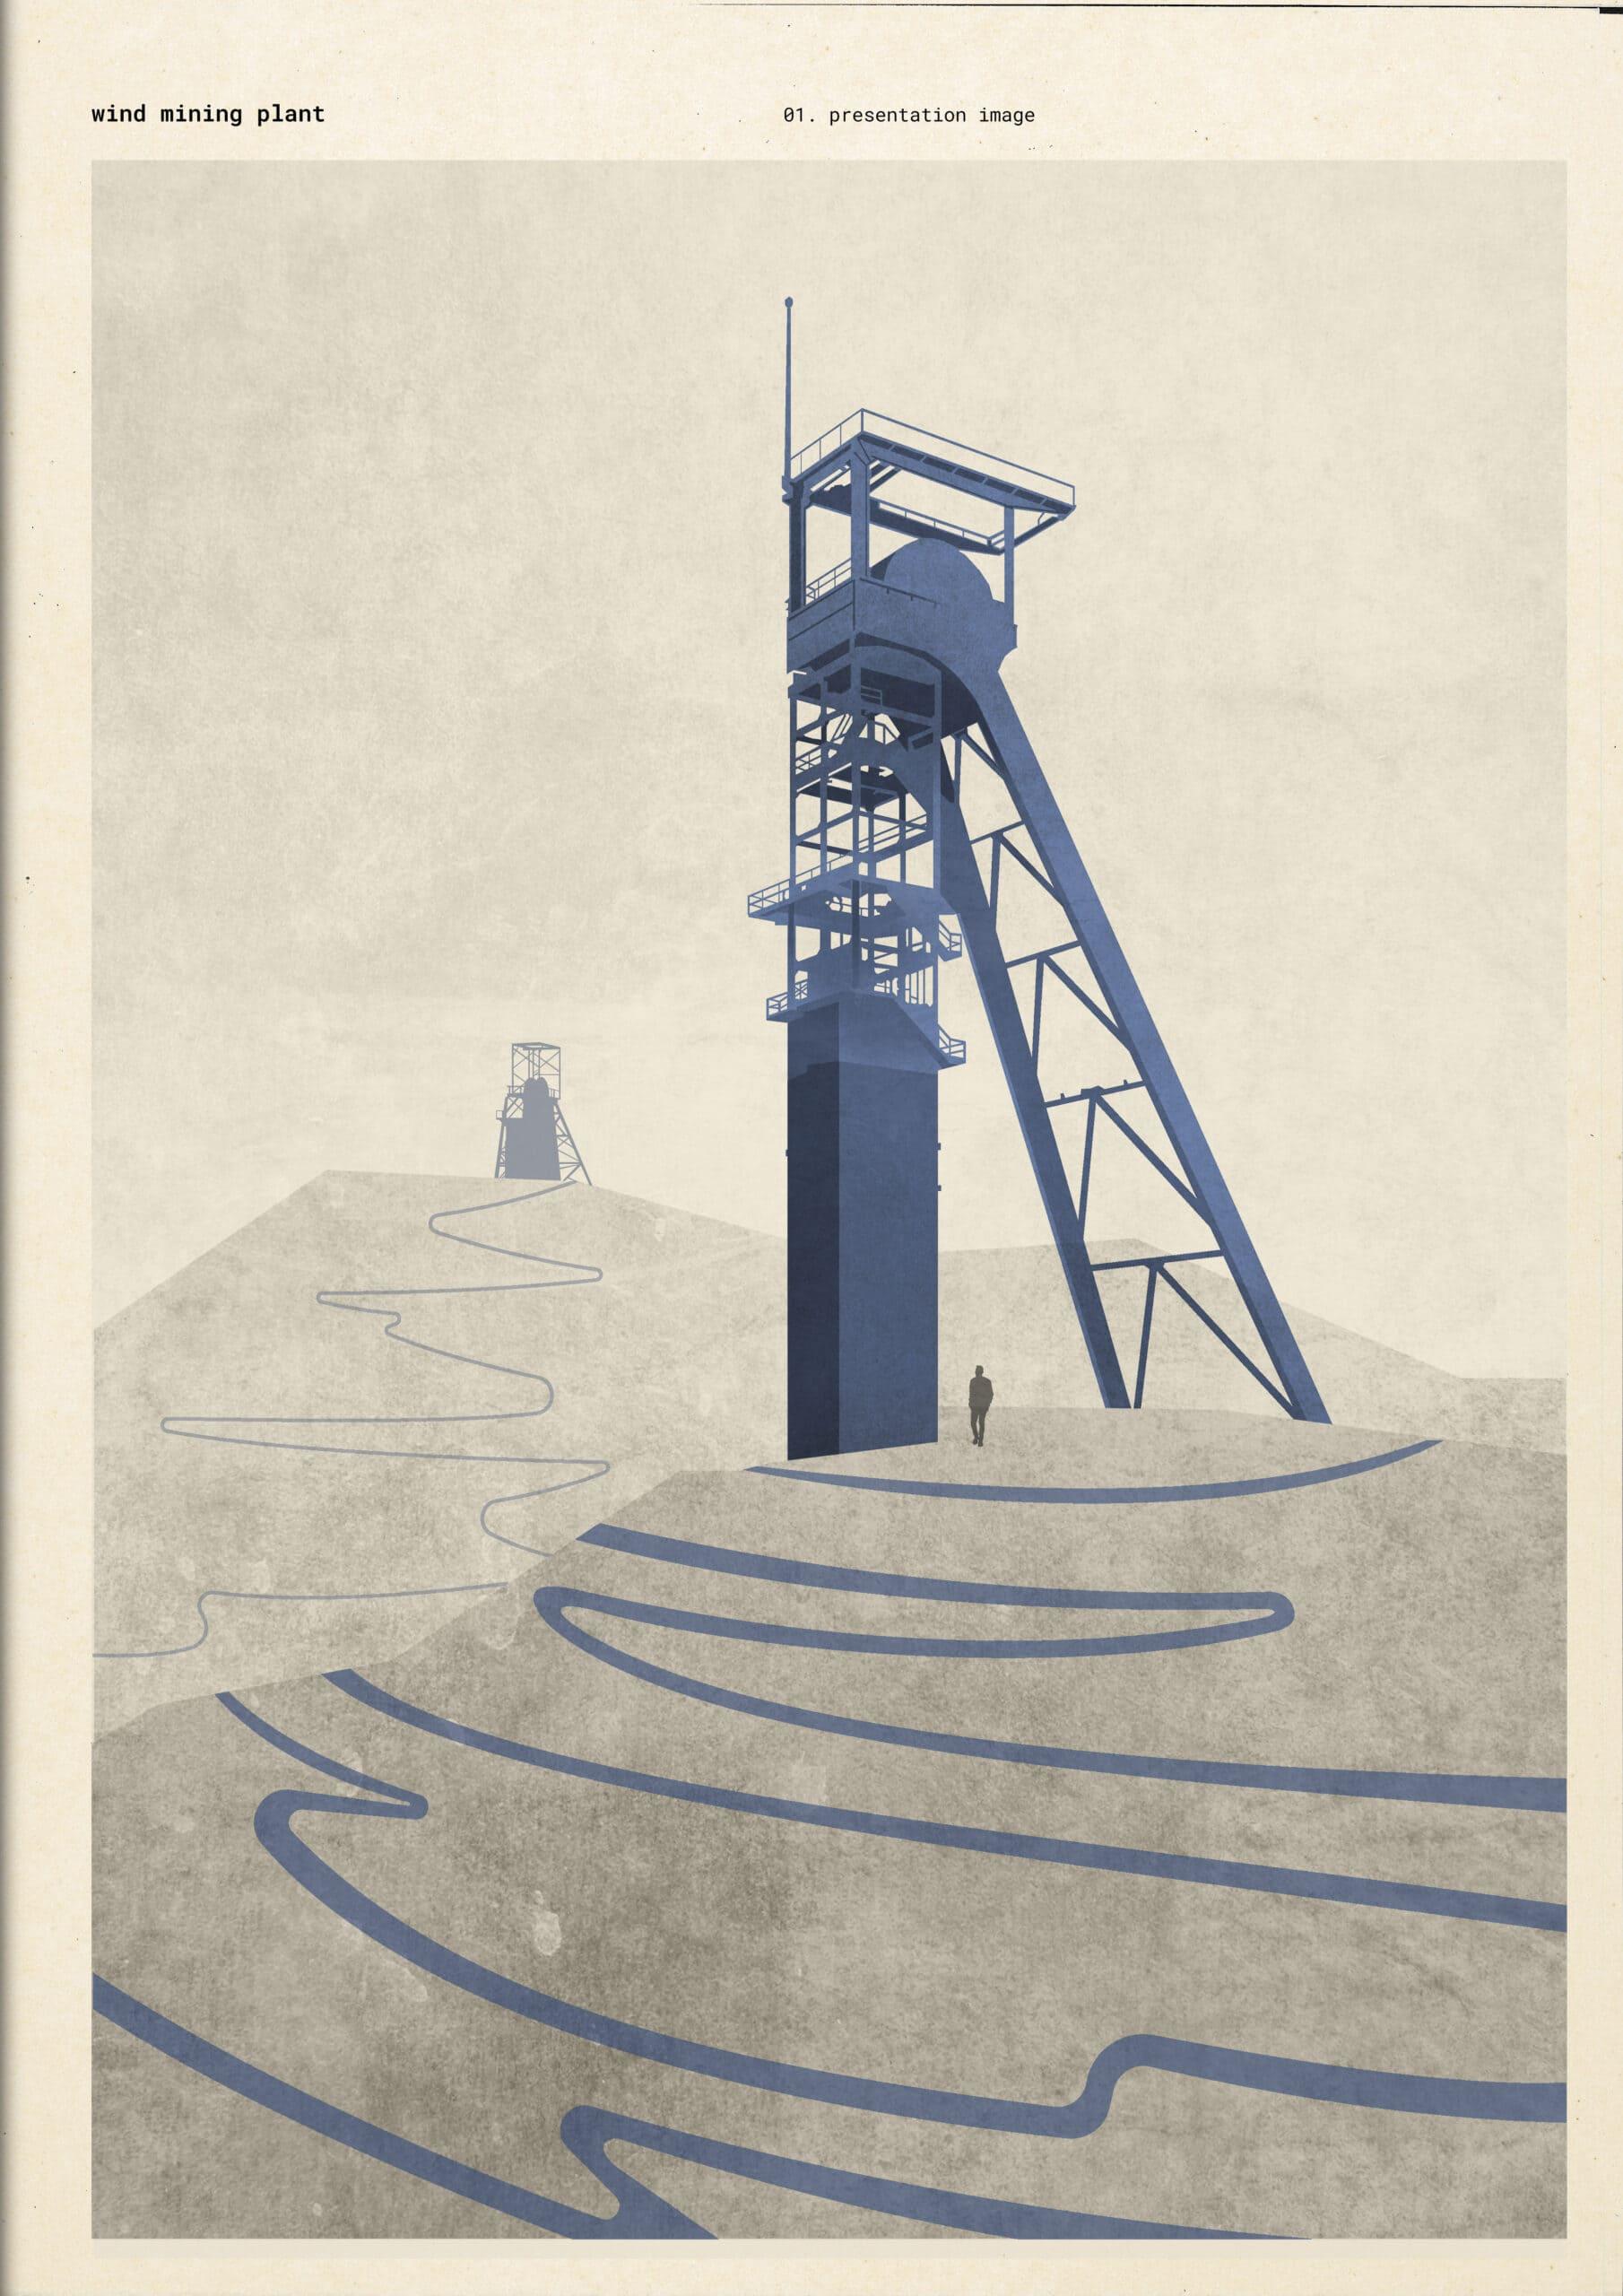 20870_Wind mining plant_Presentation